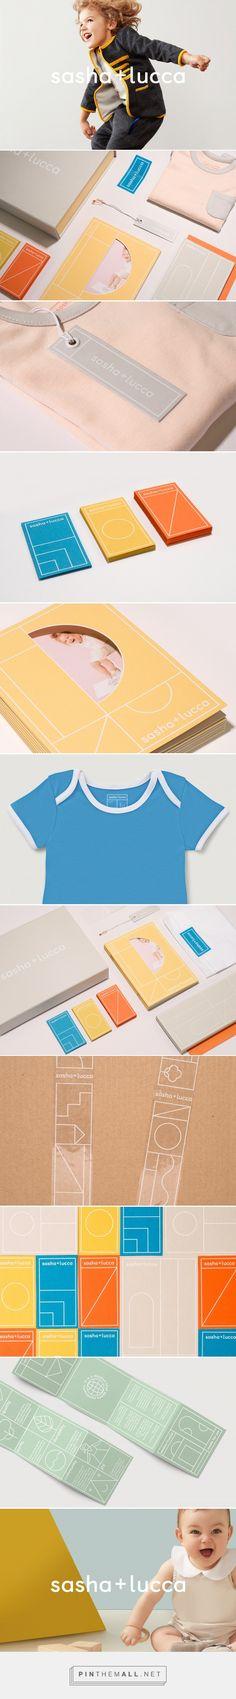 sasha + lucca Brand Identity on Behance. Visual identity, logo design, branding.